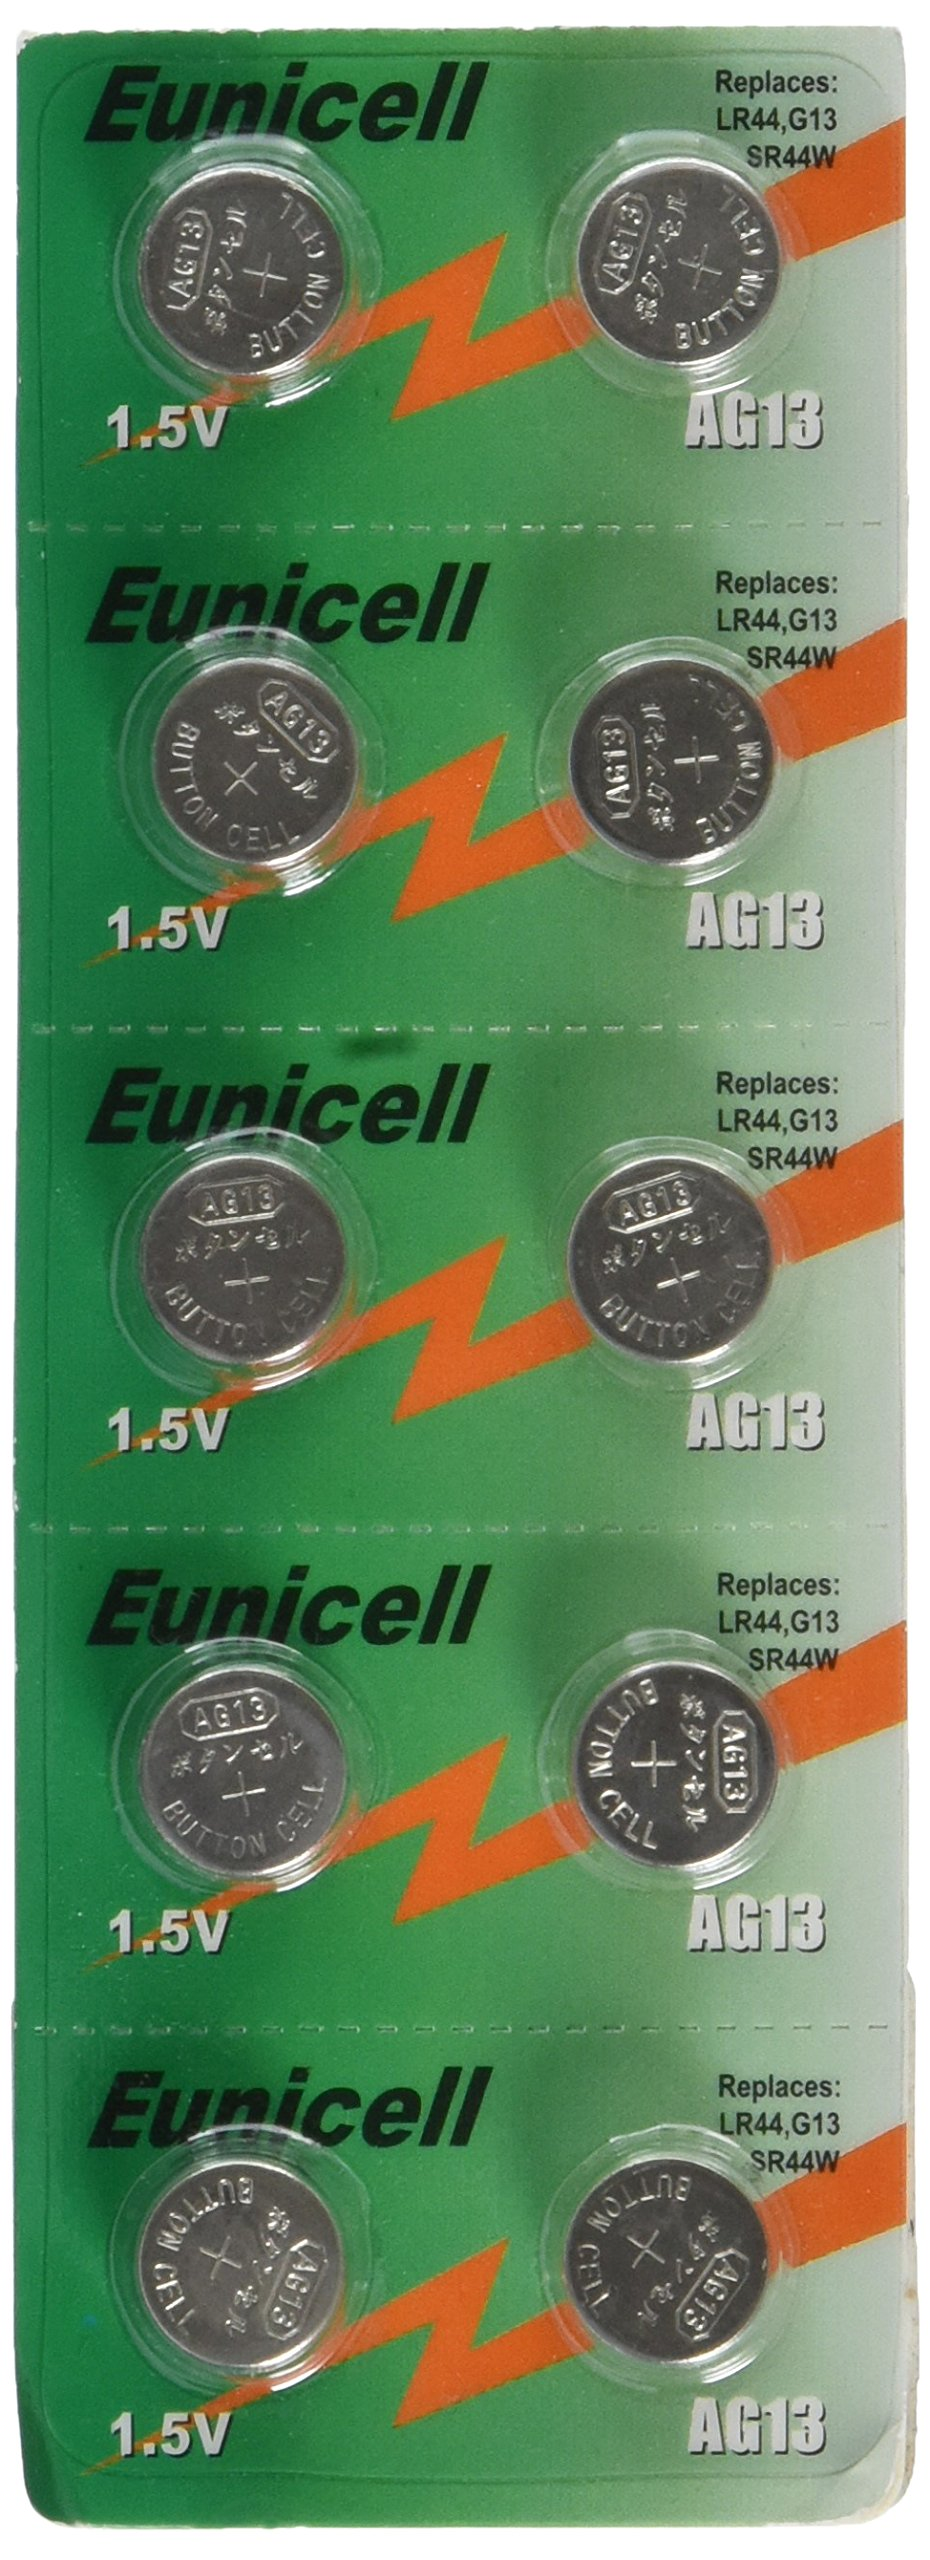 Eunicell 10 X AG13 LR44 Button Cells Batteries - A76 L1154 SR44 G13 357 - 1.5V